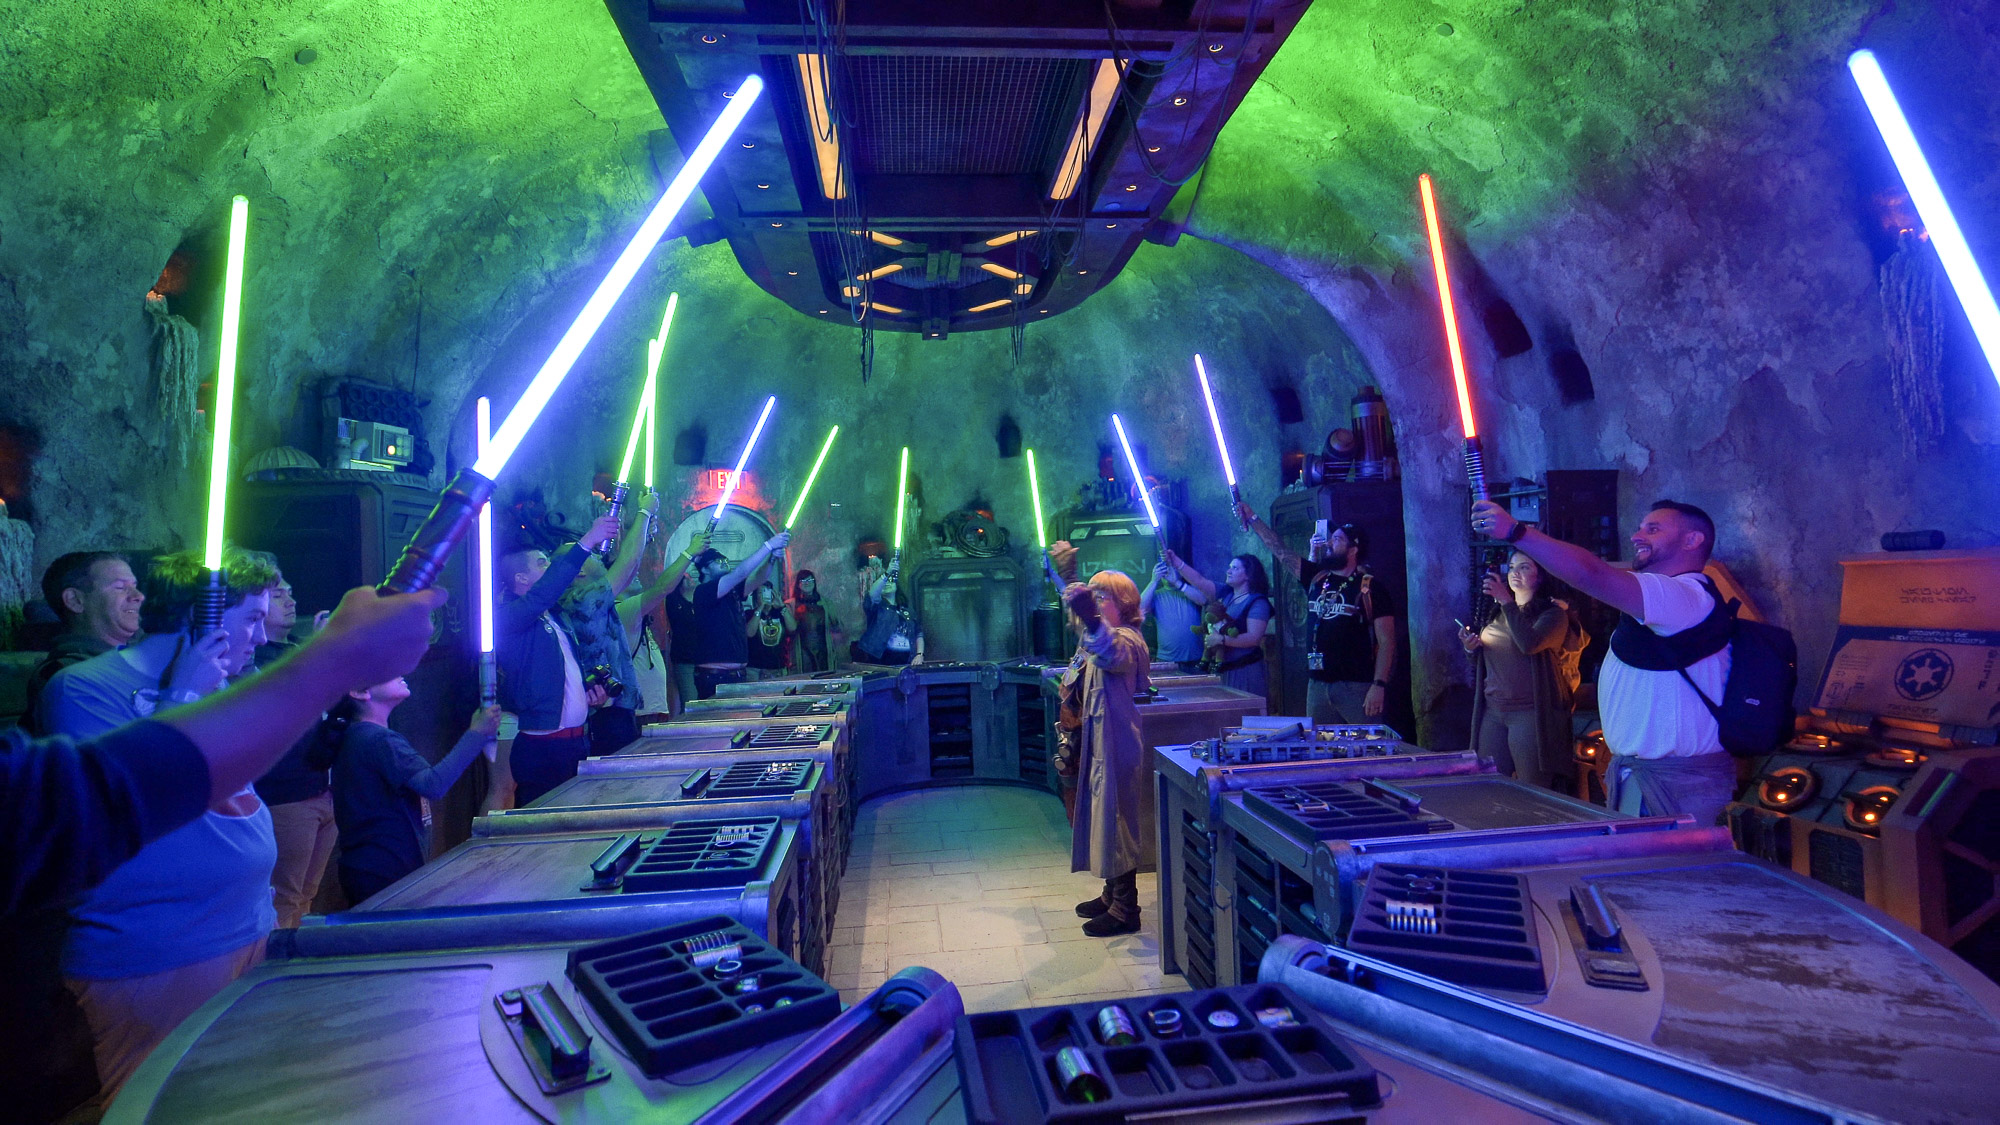 hight resolution of savi s workshop custom handbuilt lightsaber experience review at star wars galaxy s edge